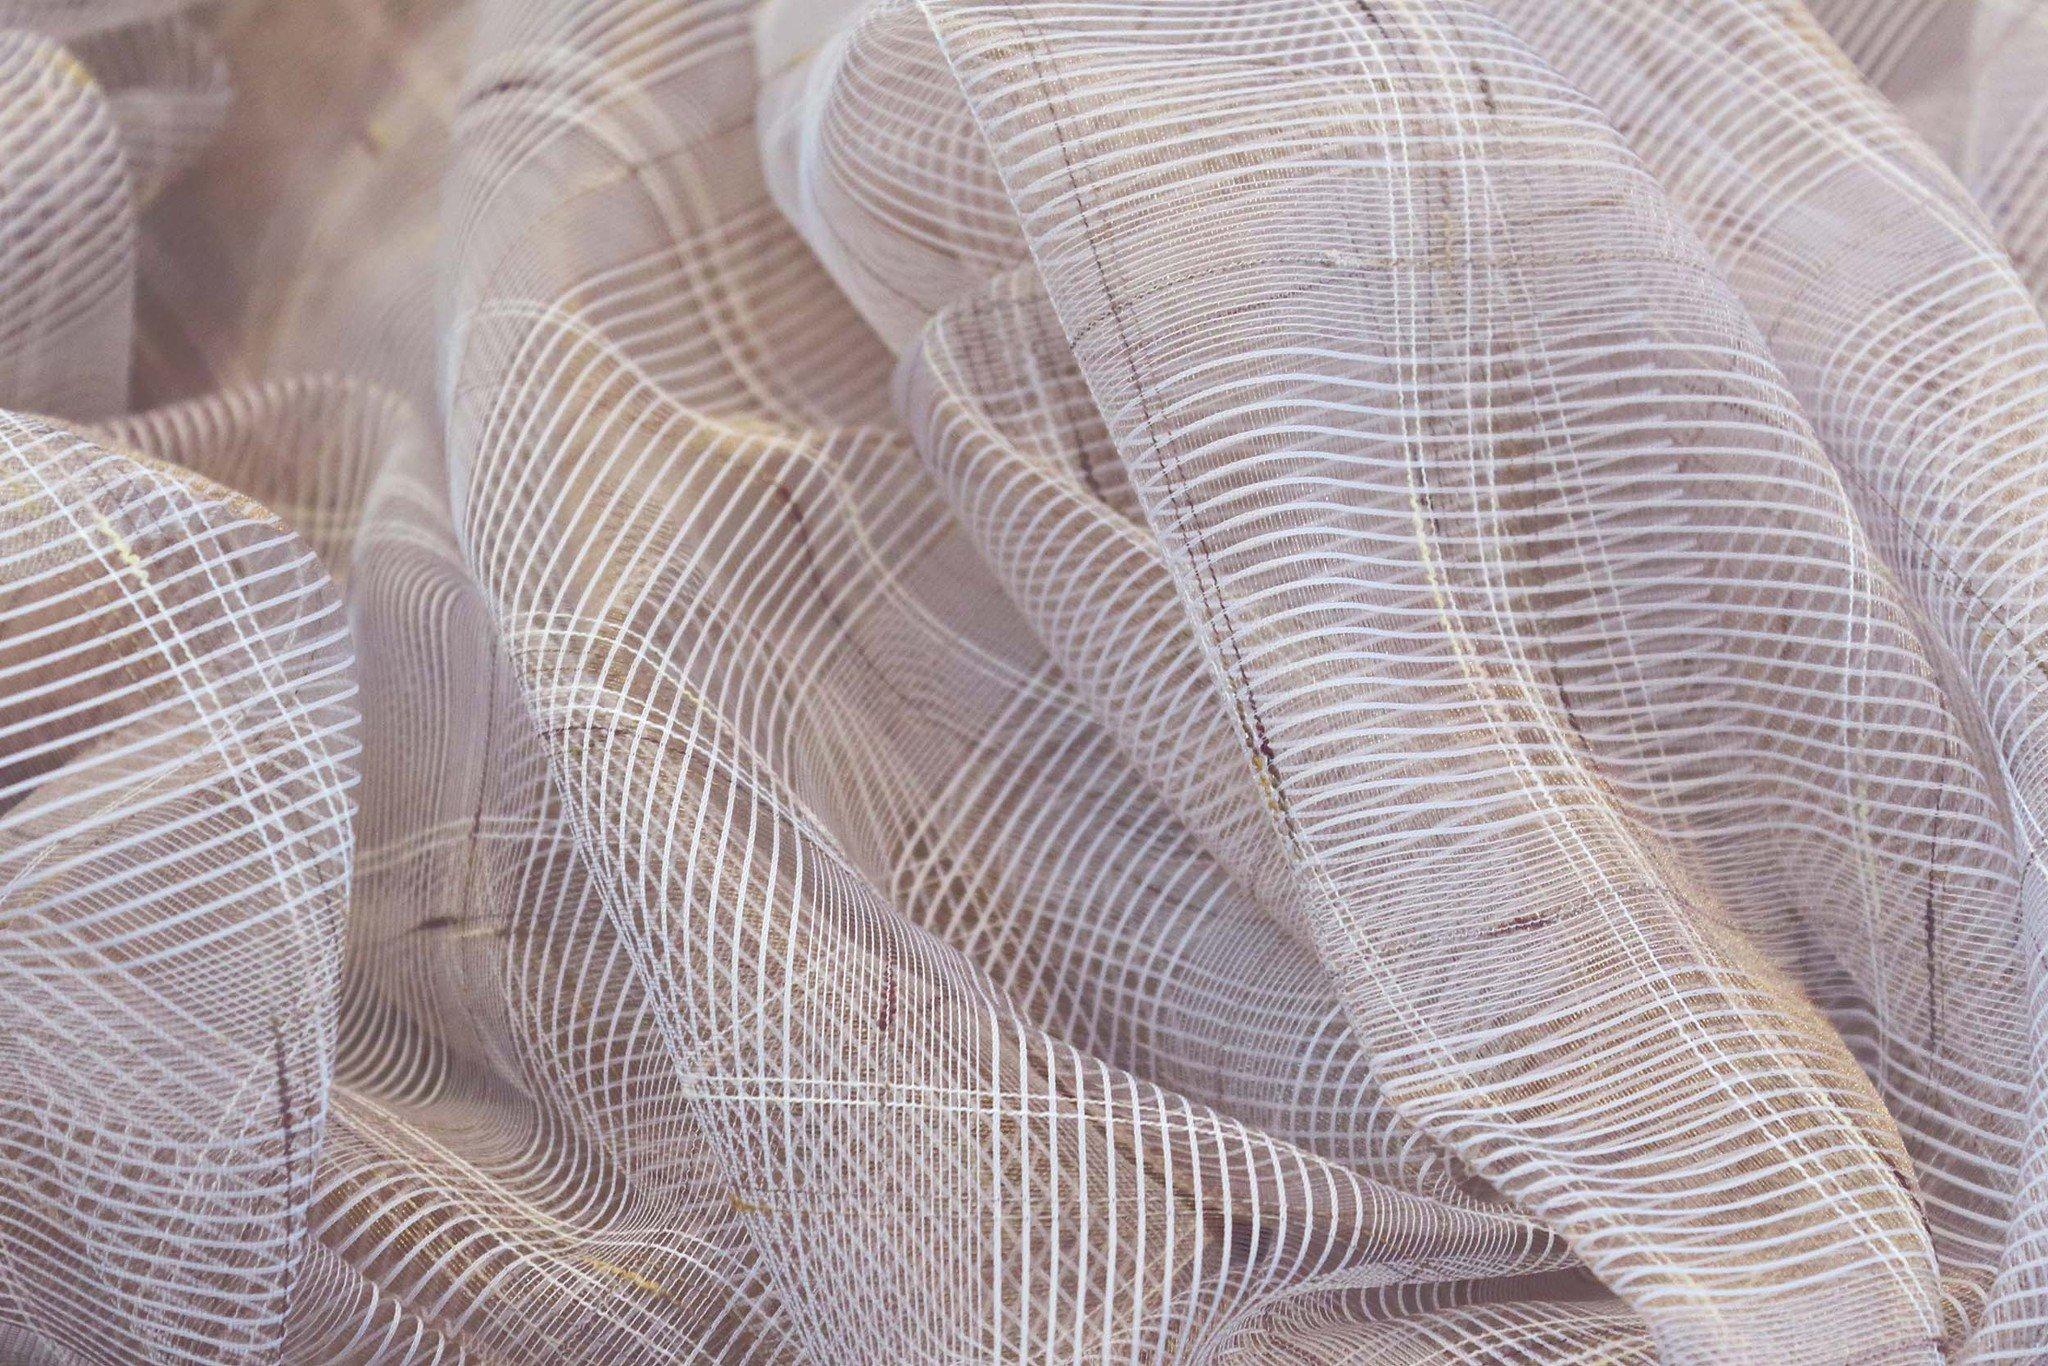 структура сетки шторы